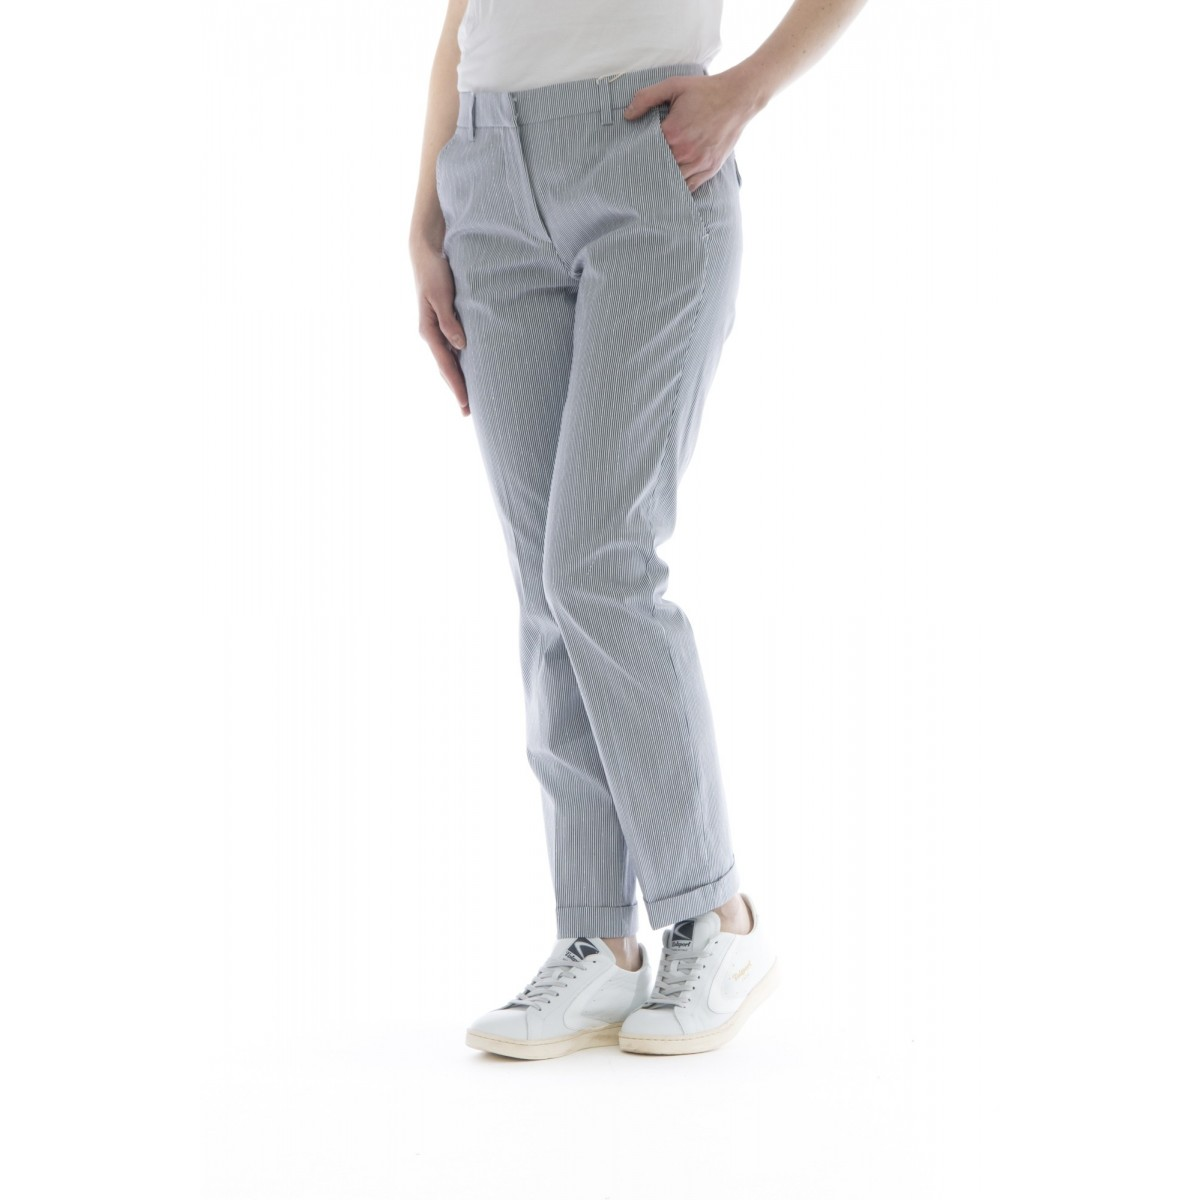 Pantalone donna - Leyre 172568 d6242 righina strech